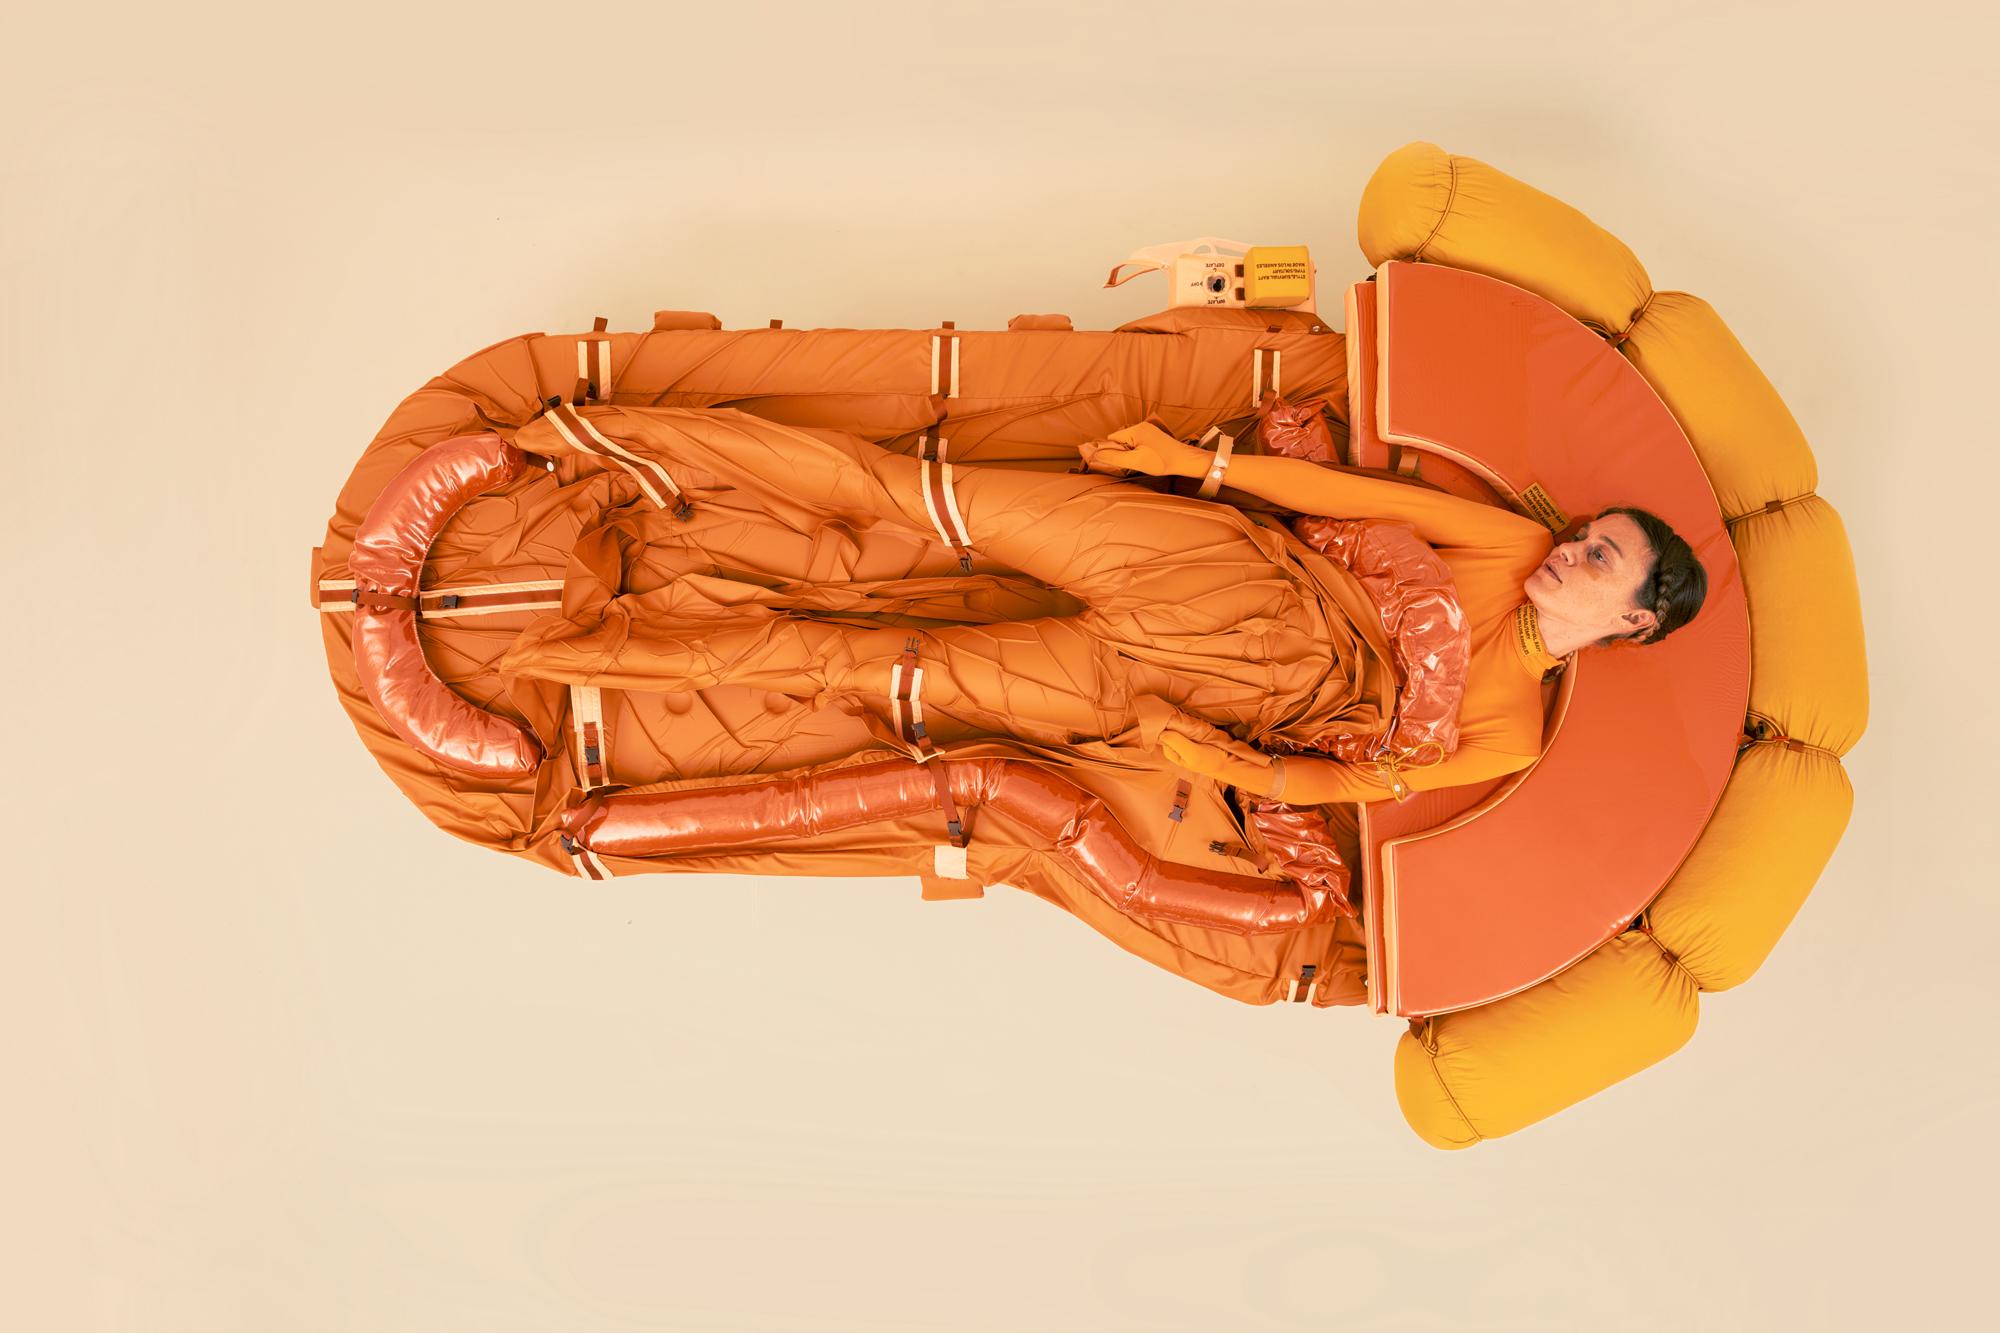 woman orange raft yellow cushions